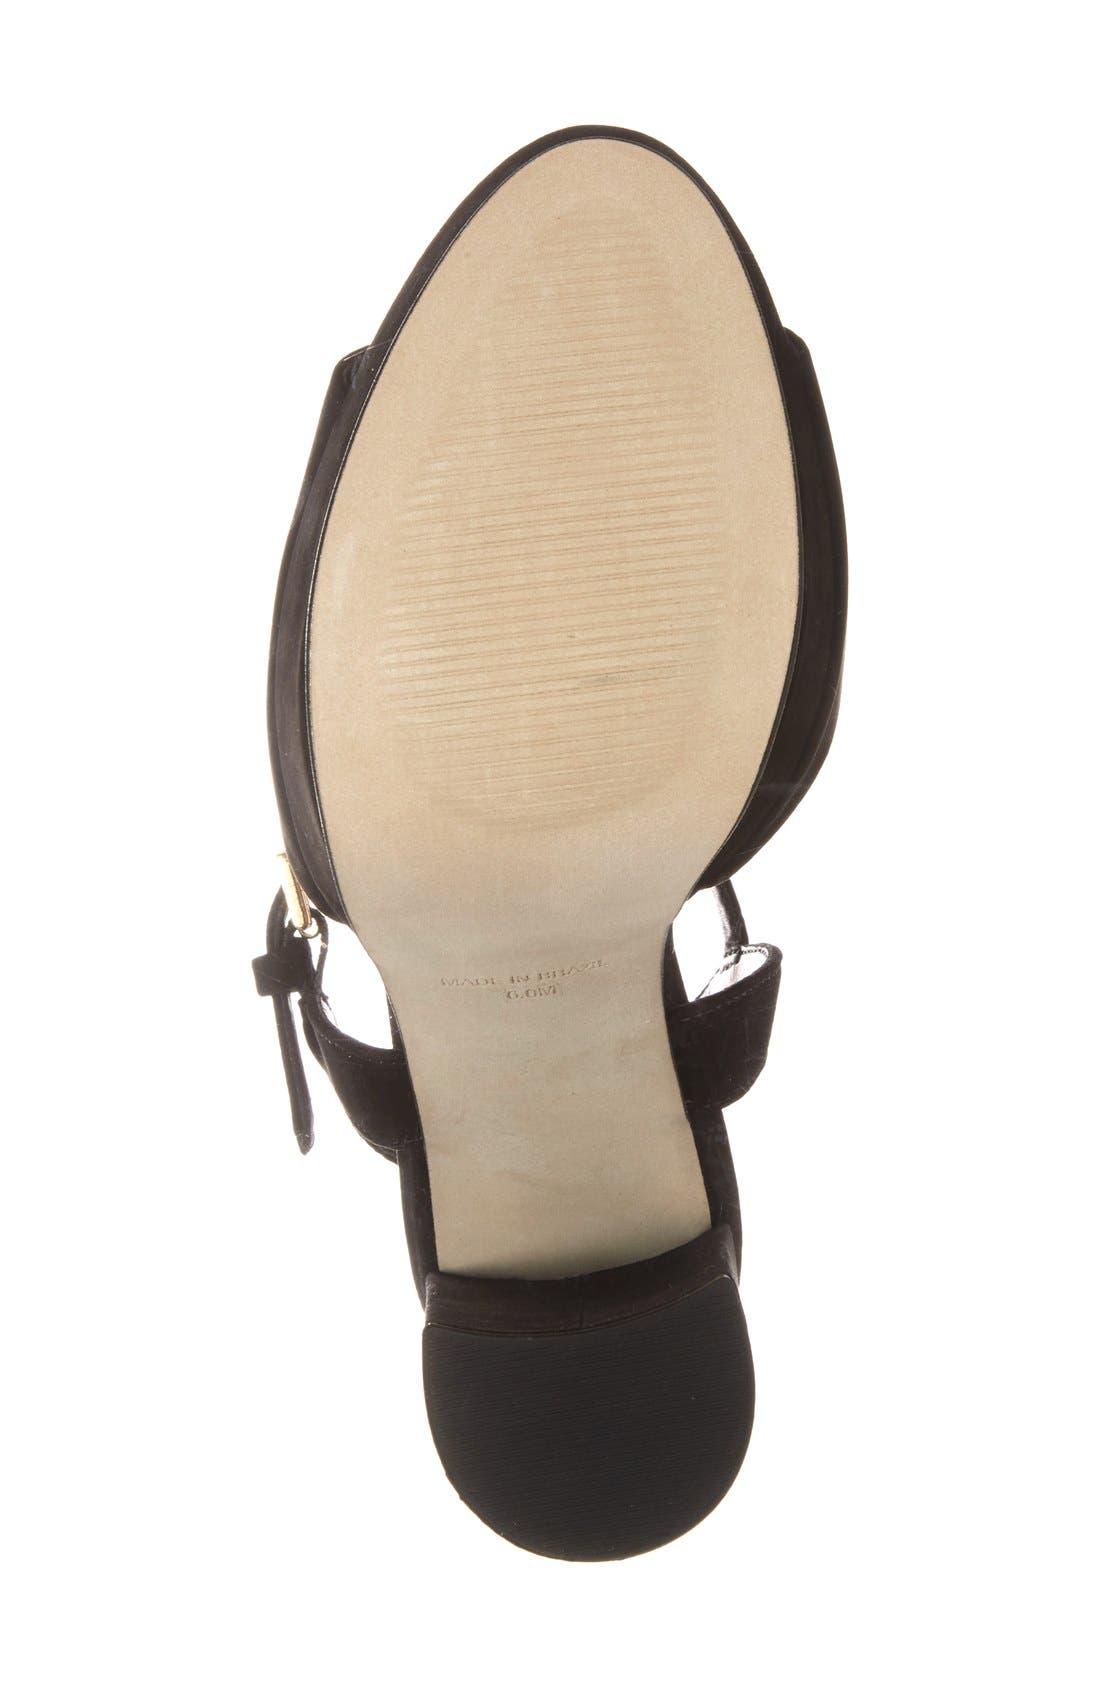 'Kierra' Platform Sandal,                             Alternate thumbnail 4, color,                             005